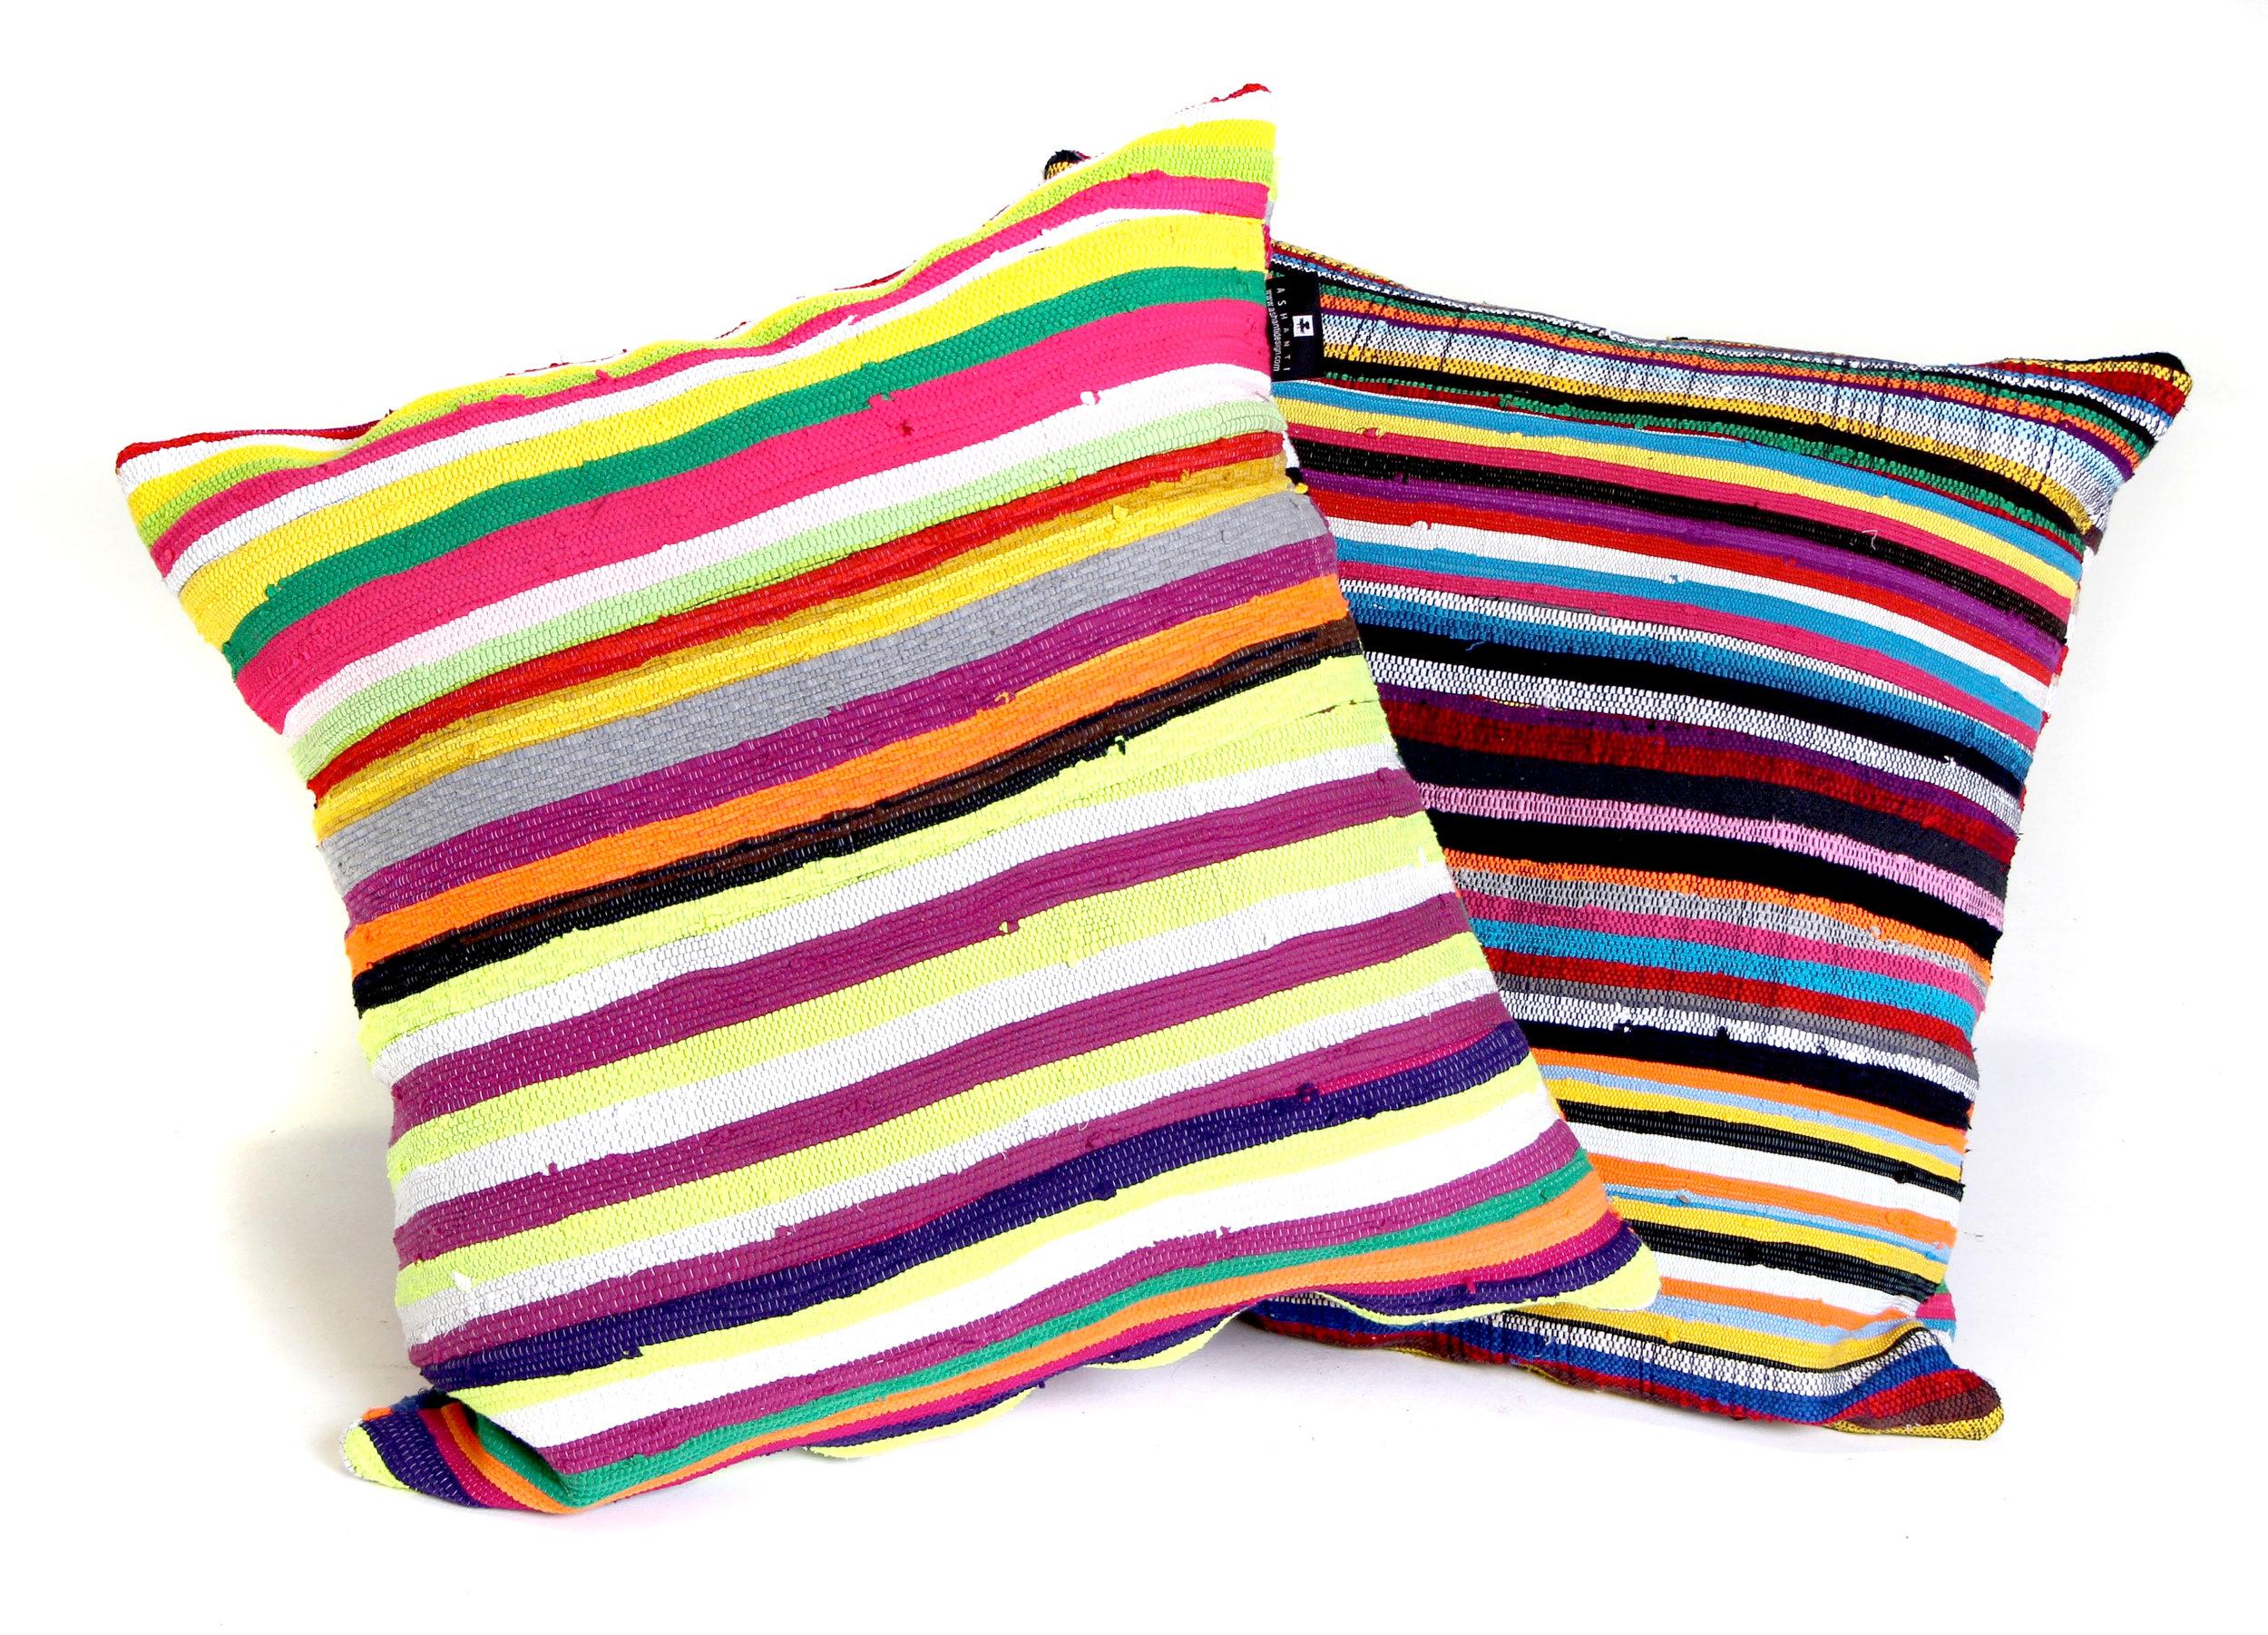 Square Pillows  by Ashanti Design